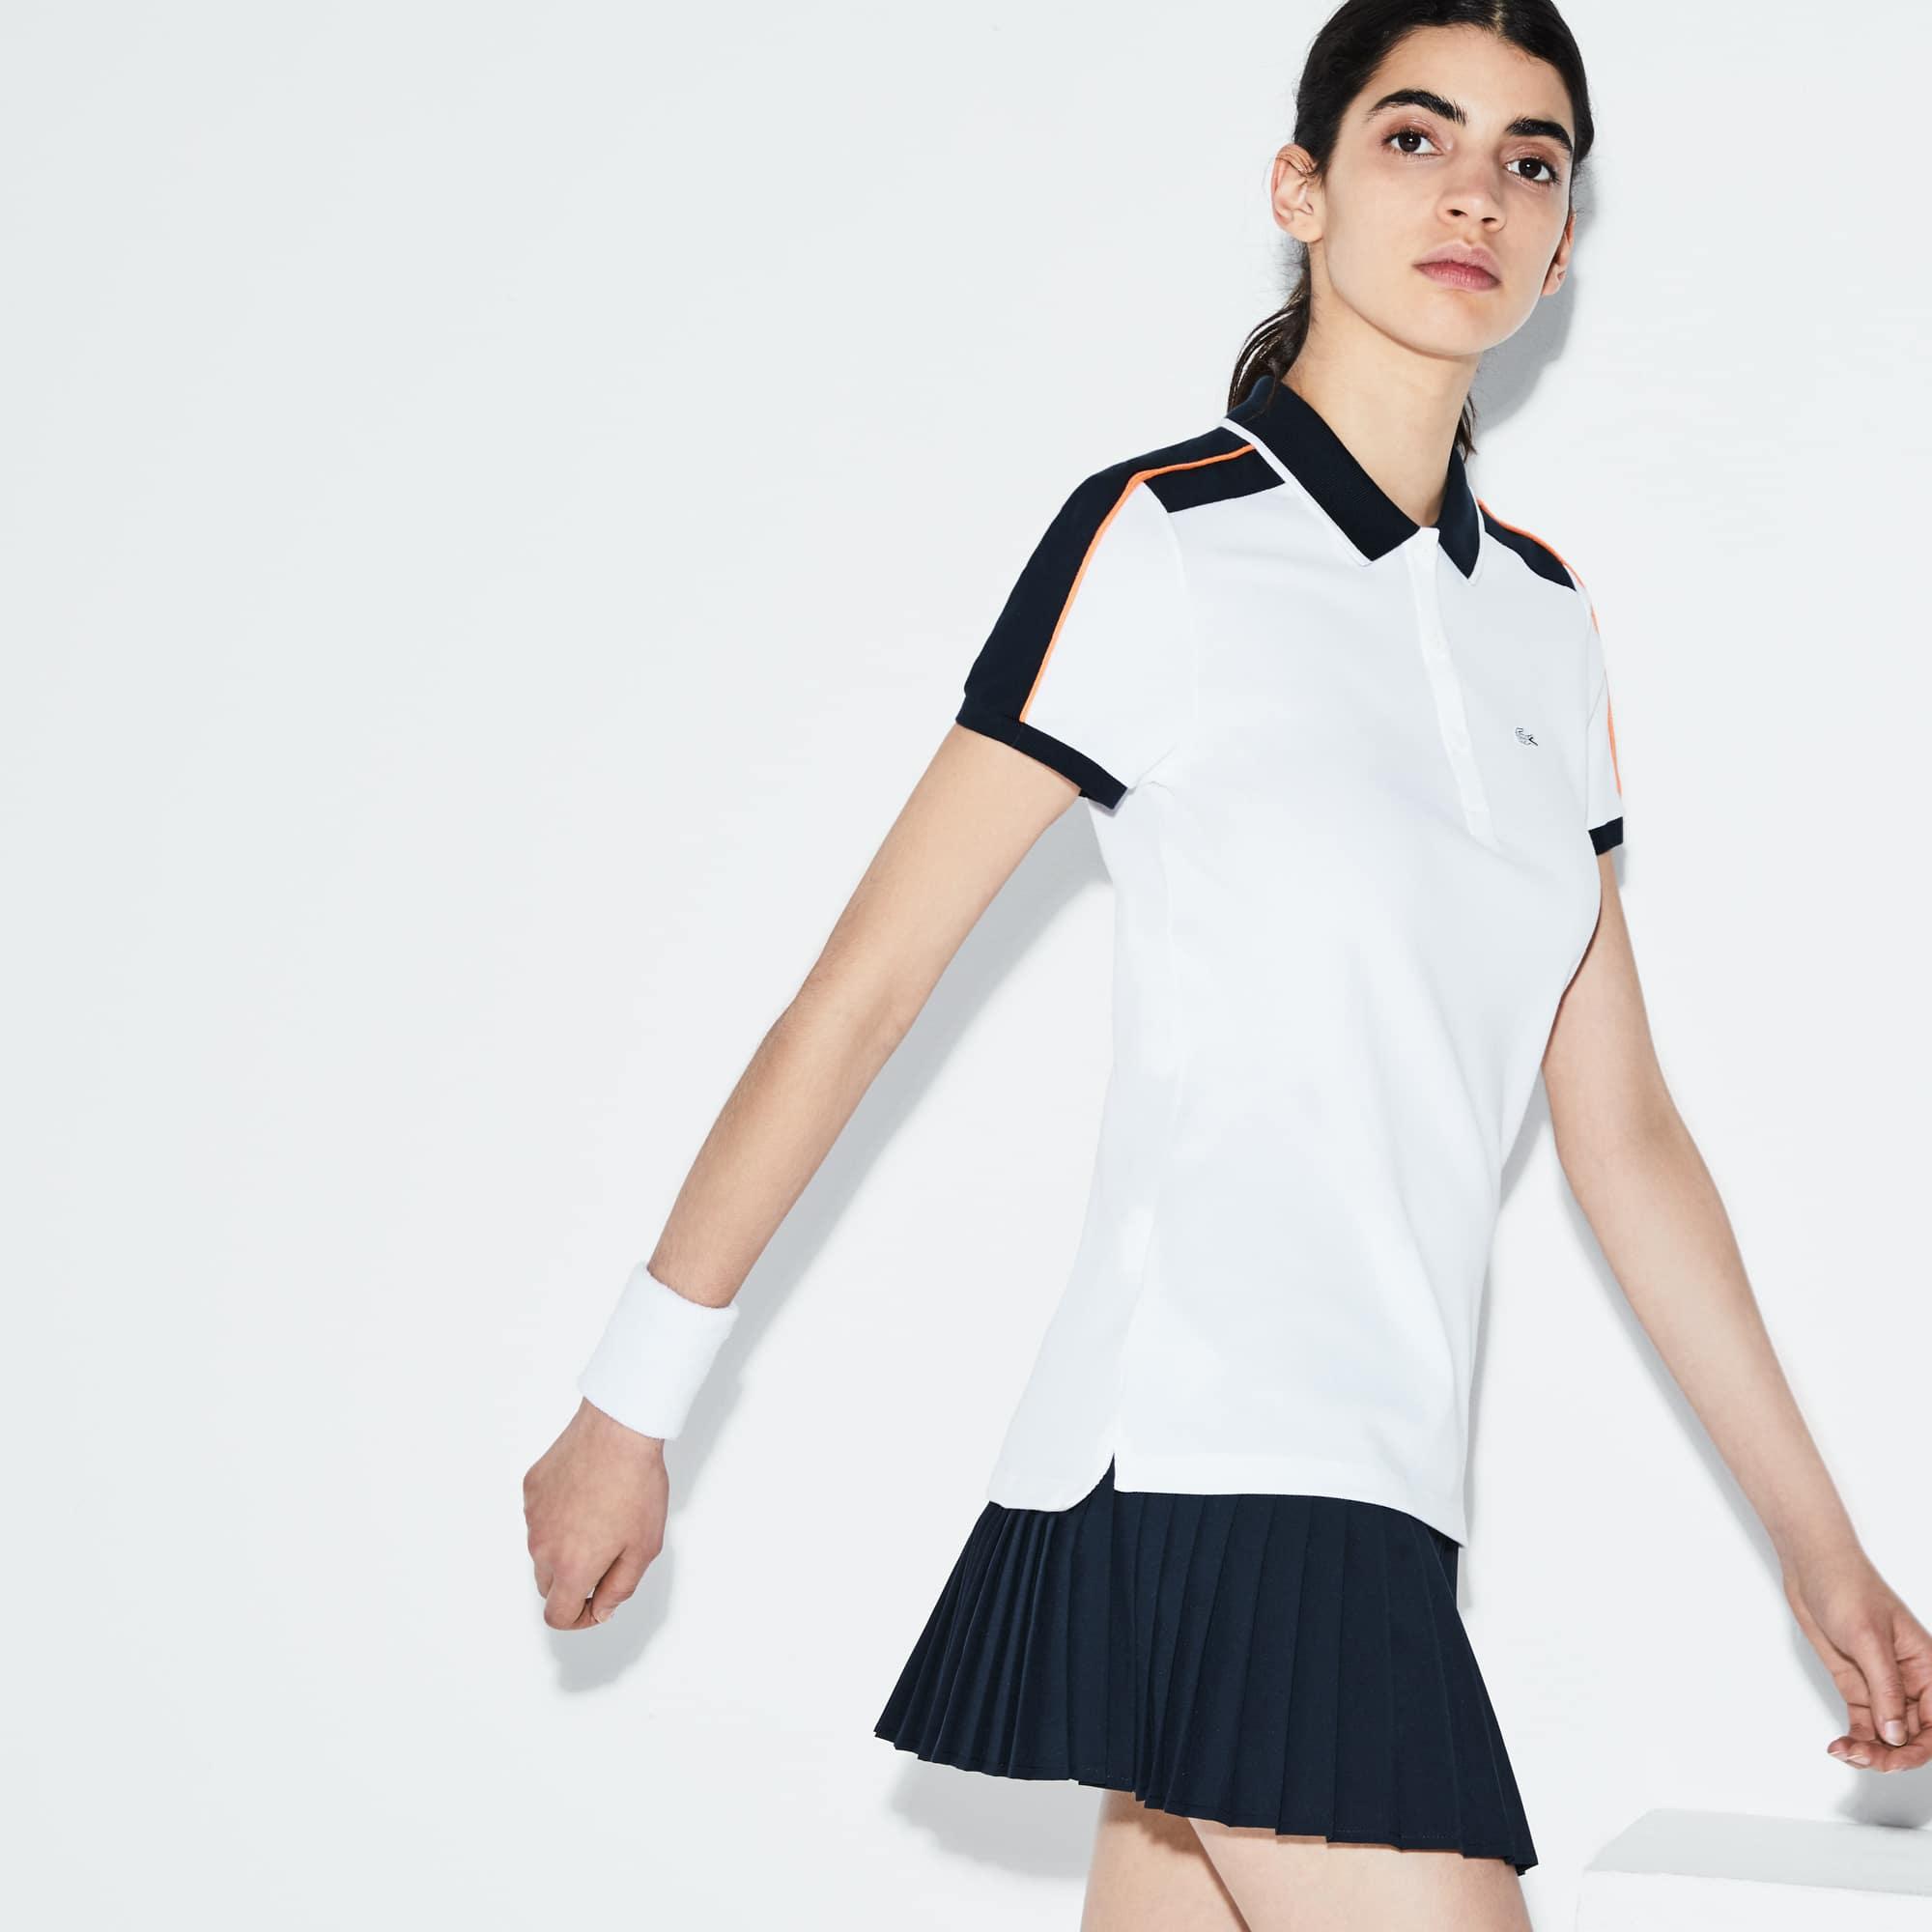 Women's Lacoste SPORT Roland Garros Edition Stretch Mini Piqué Polo Shirt